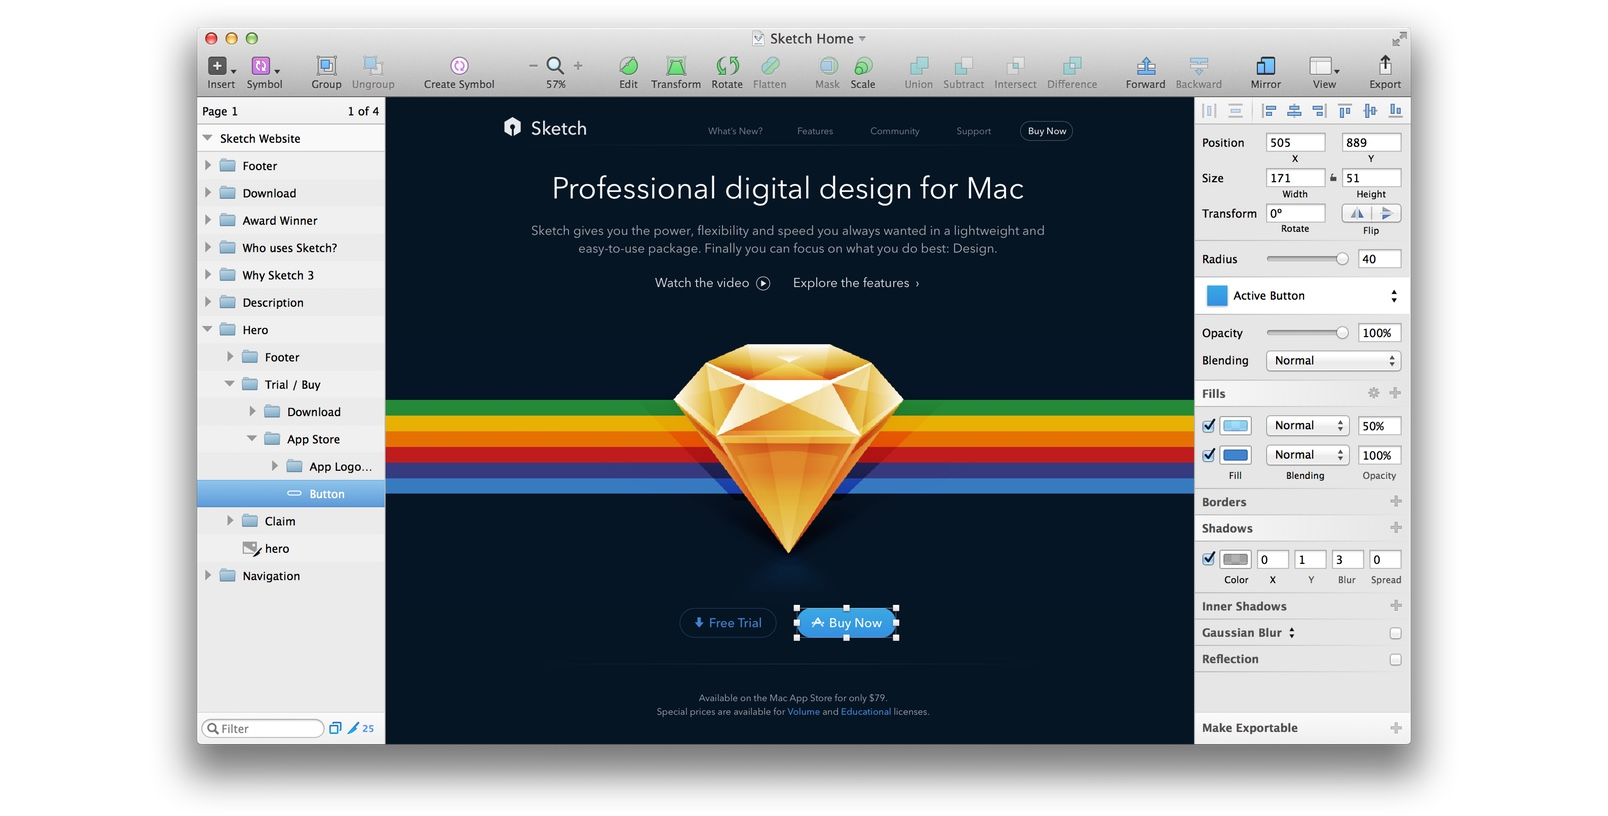 Sketch's new licensing may turn heads toward Adobe